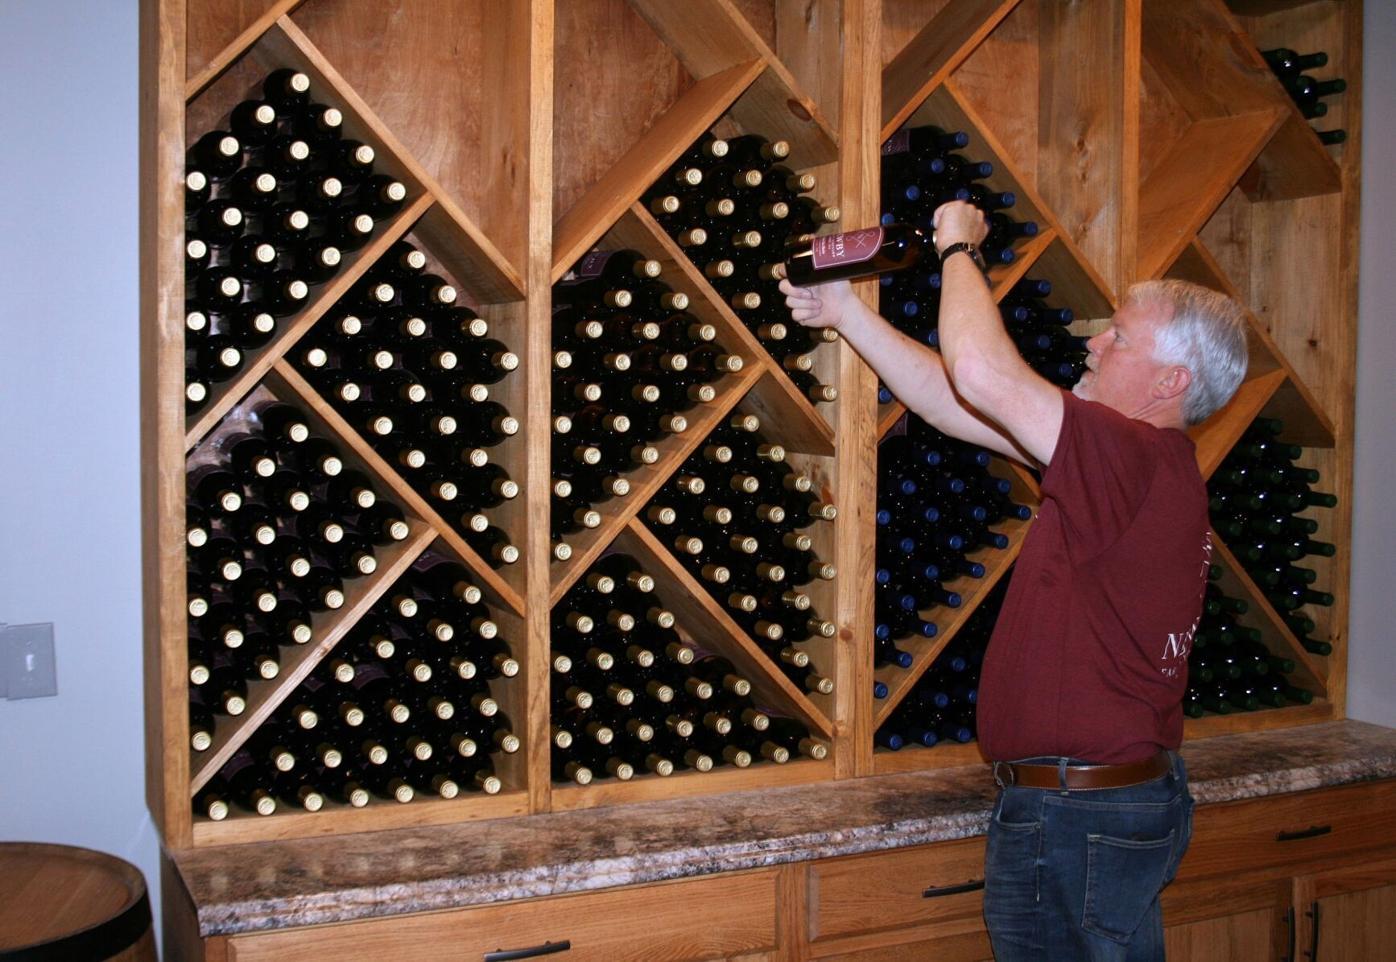 Newby Farm and Vineyard wine tasting room to open next week